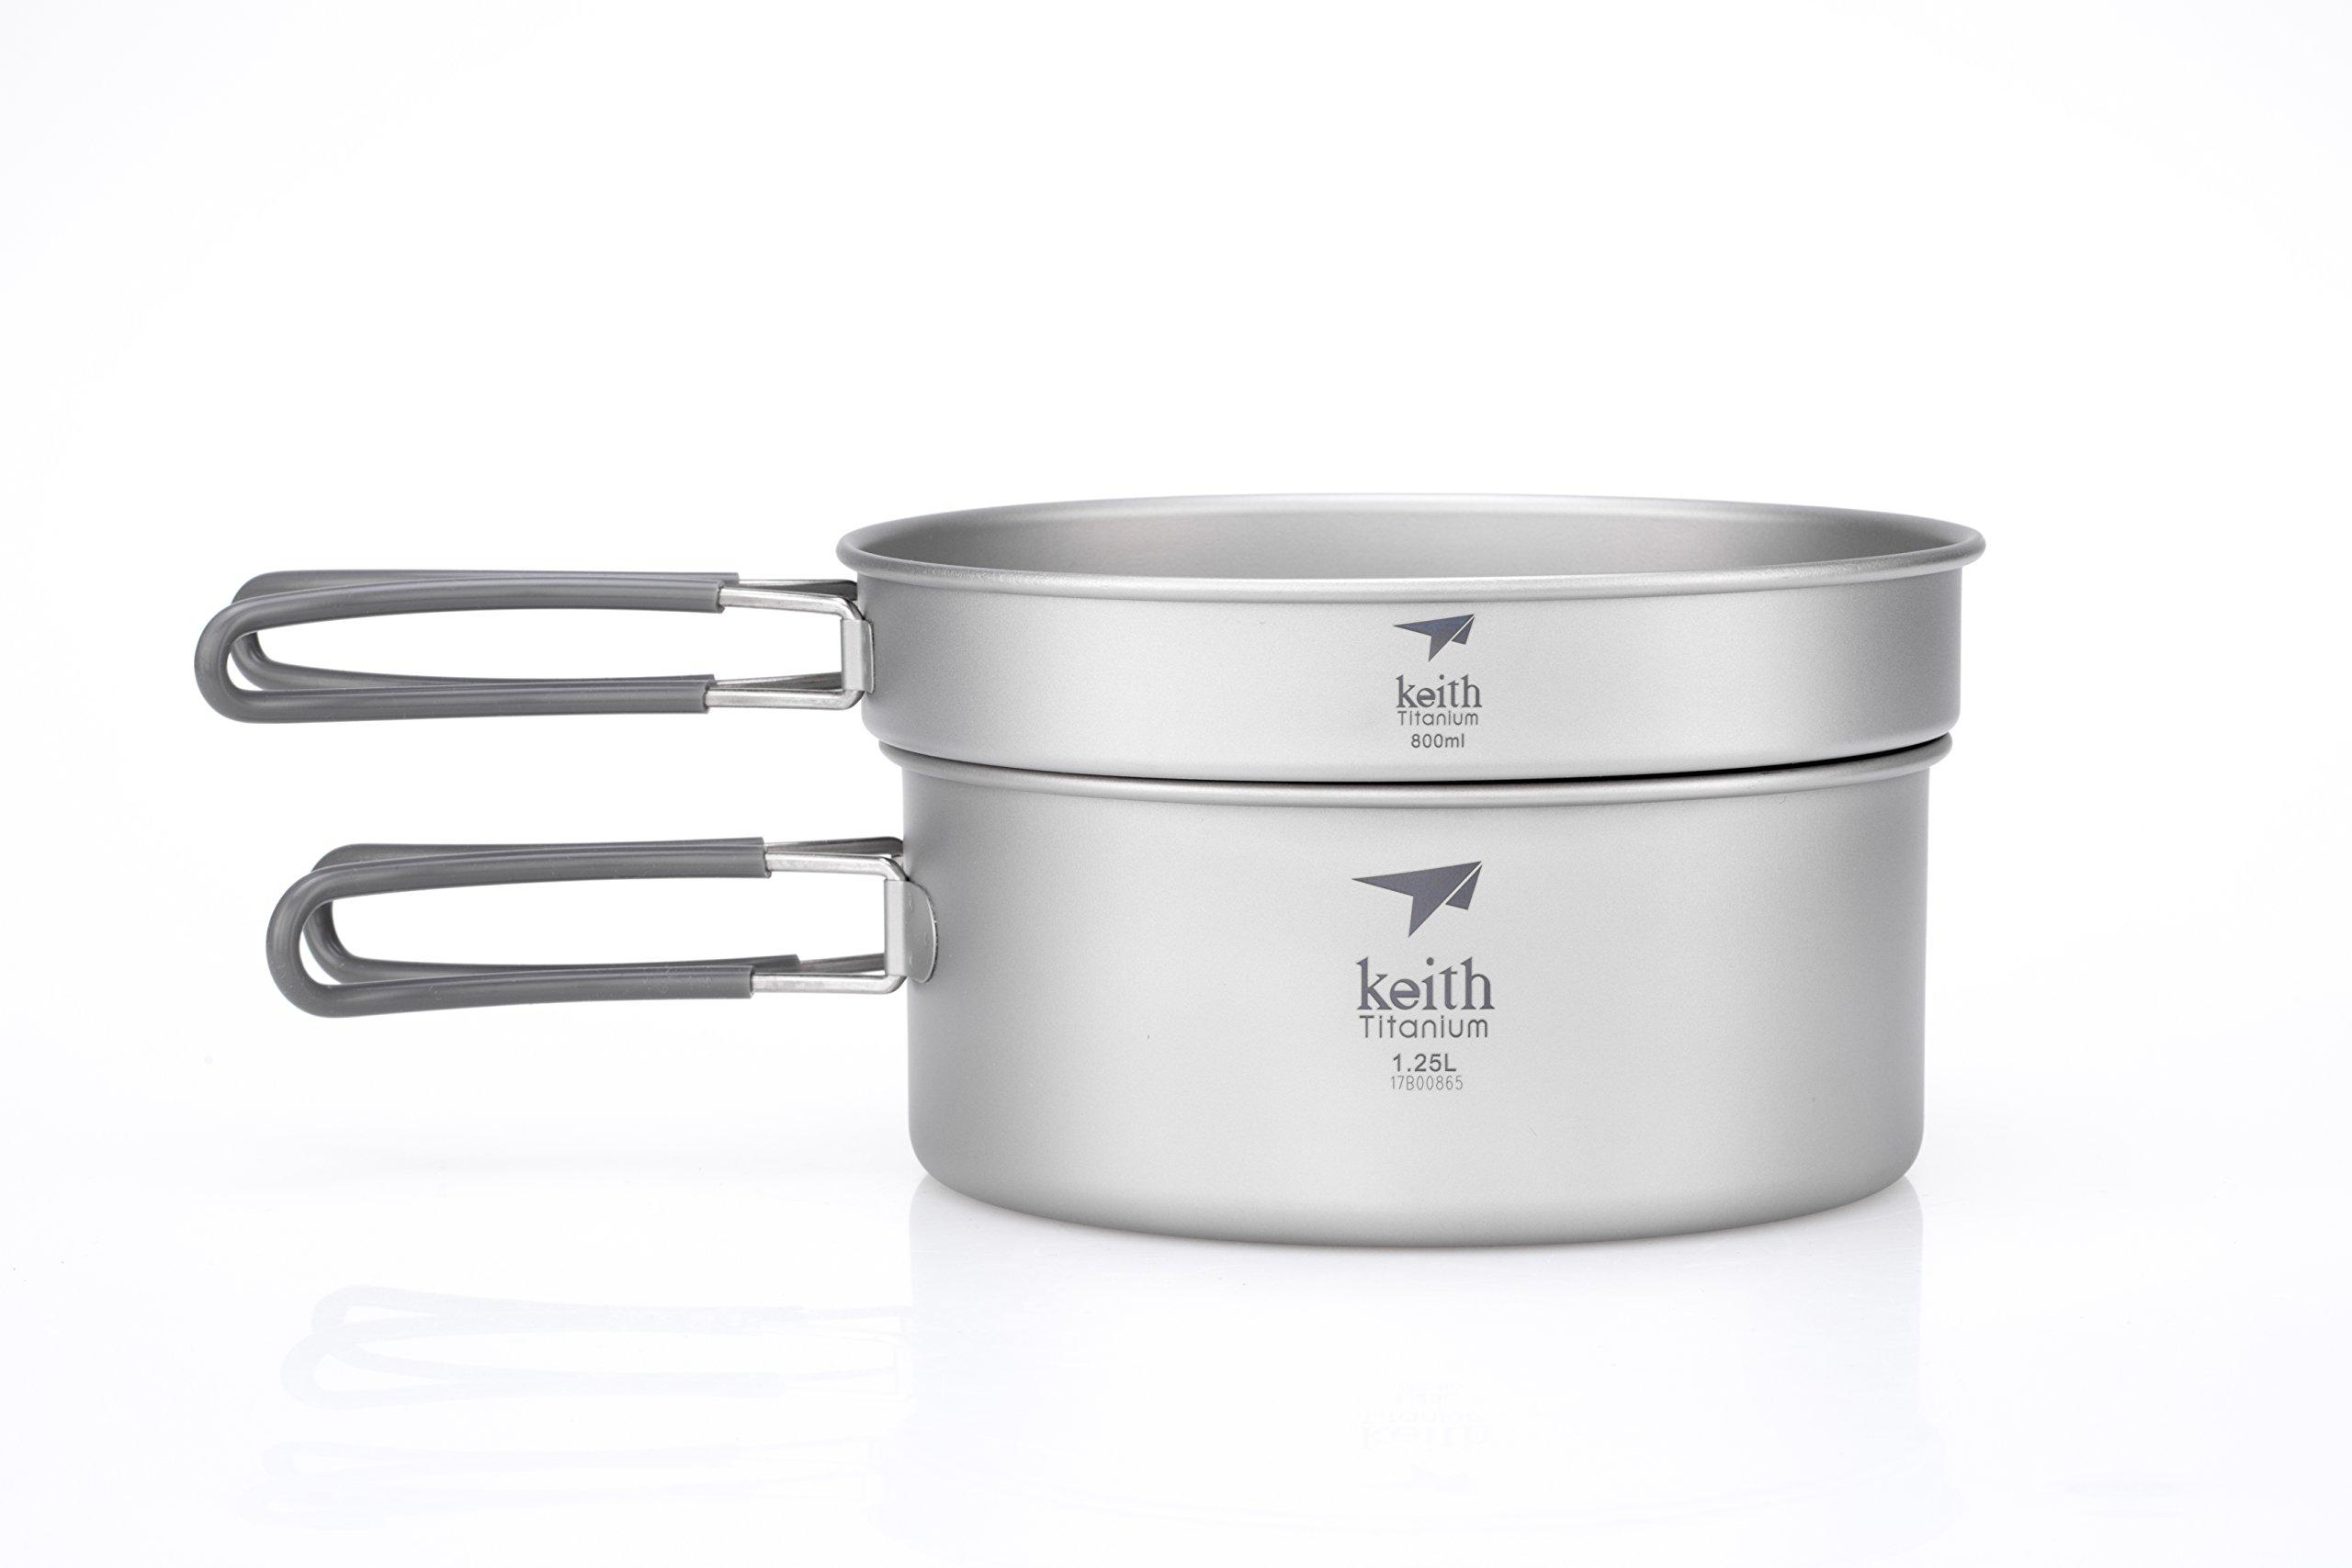 Keith Titanium Ti6017 2-Piece Pot and Pan Cook Set - 2.05 L (Limited Time Price) by Keith Titanium